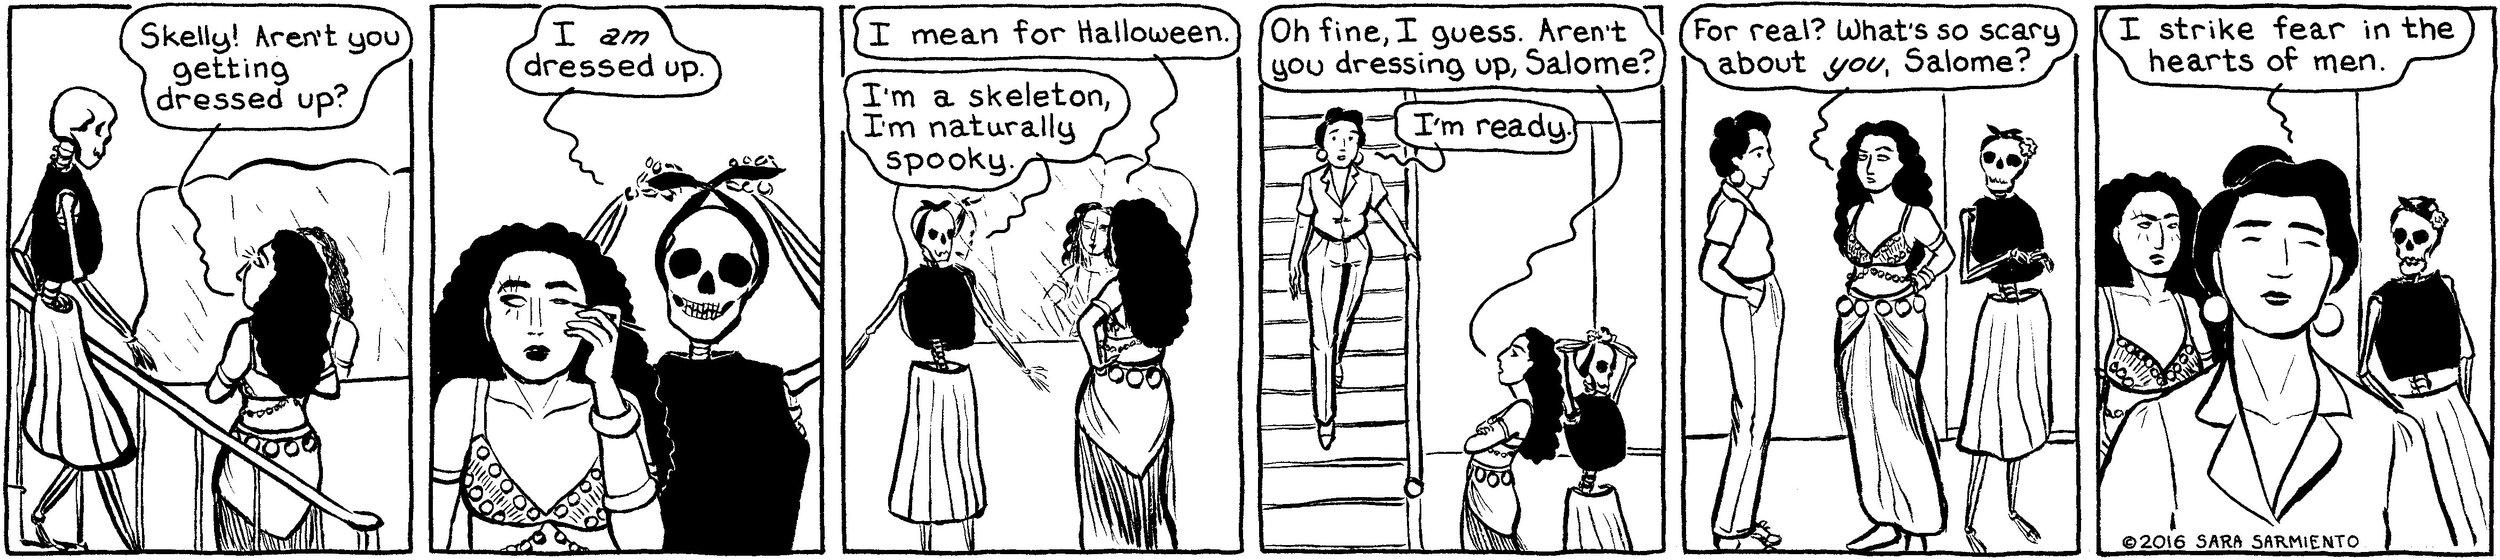 Restless-Halloween-10-24.jpg